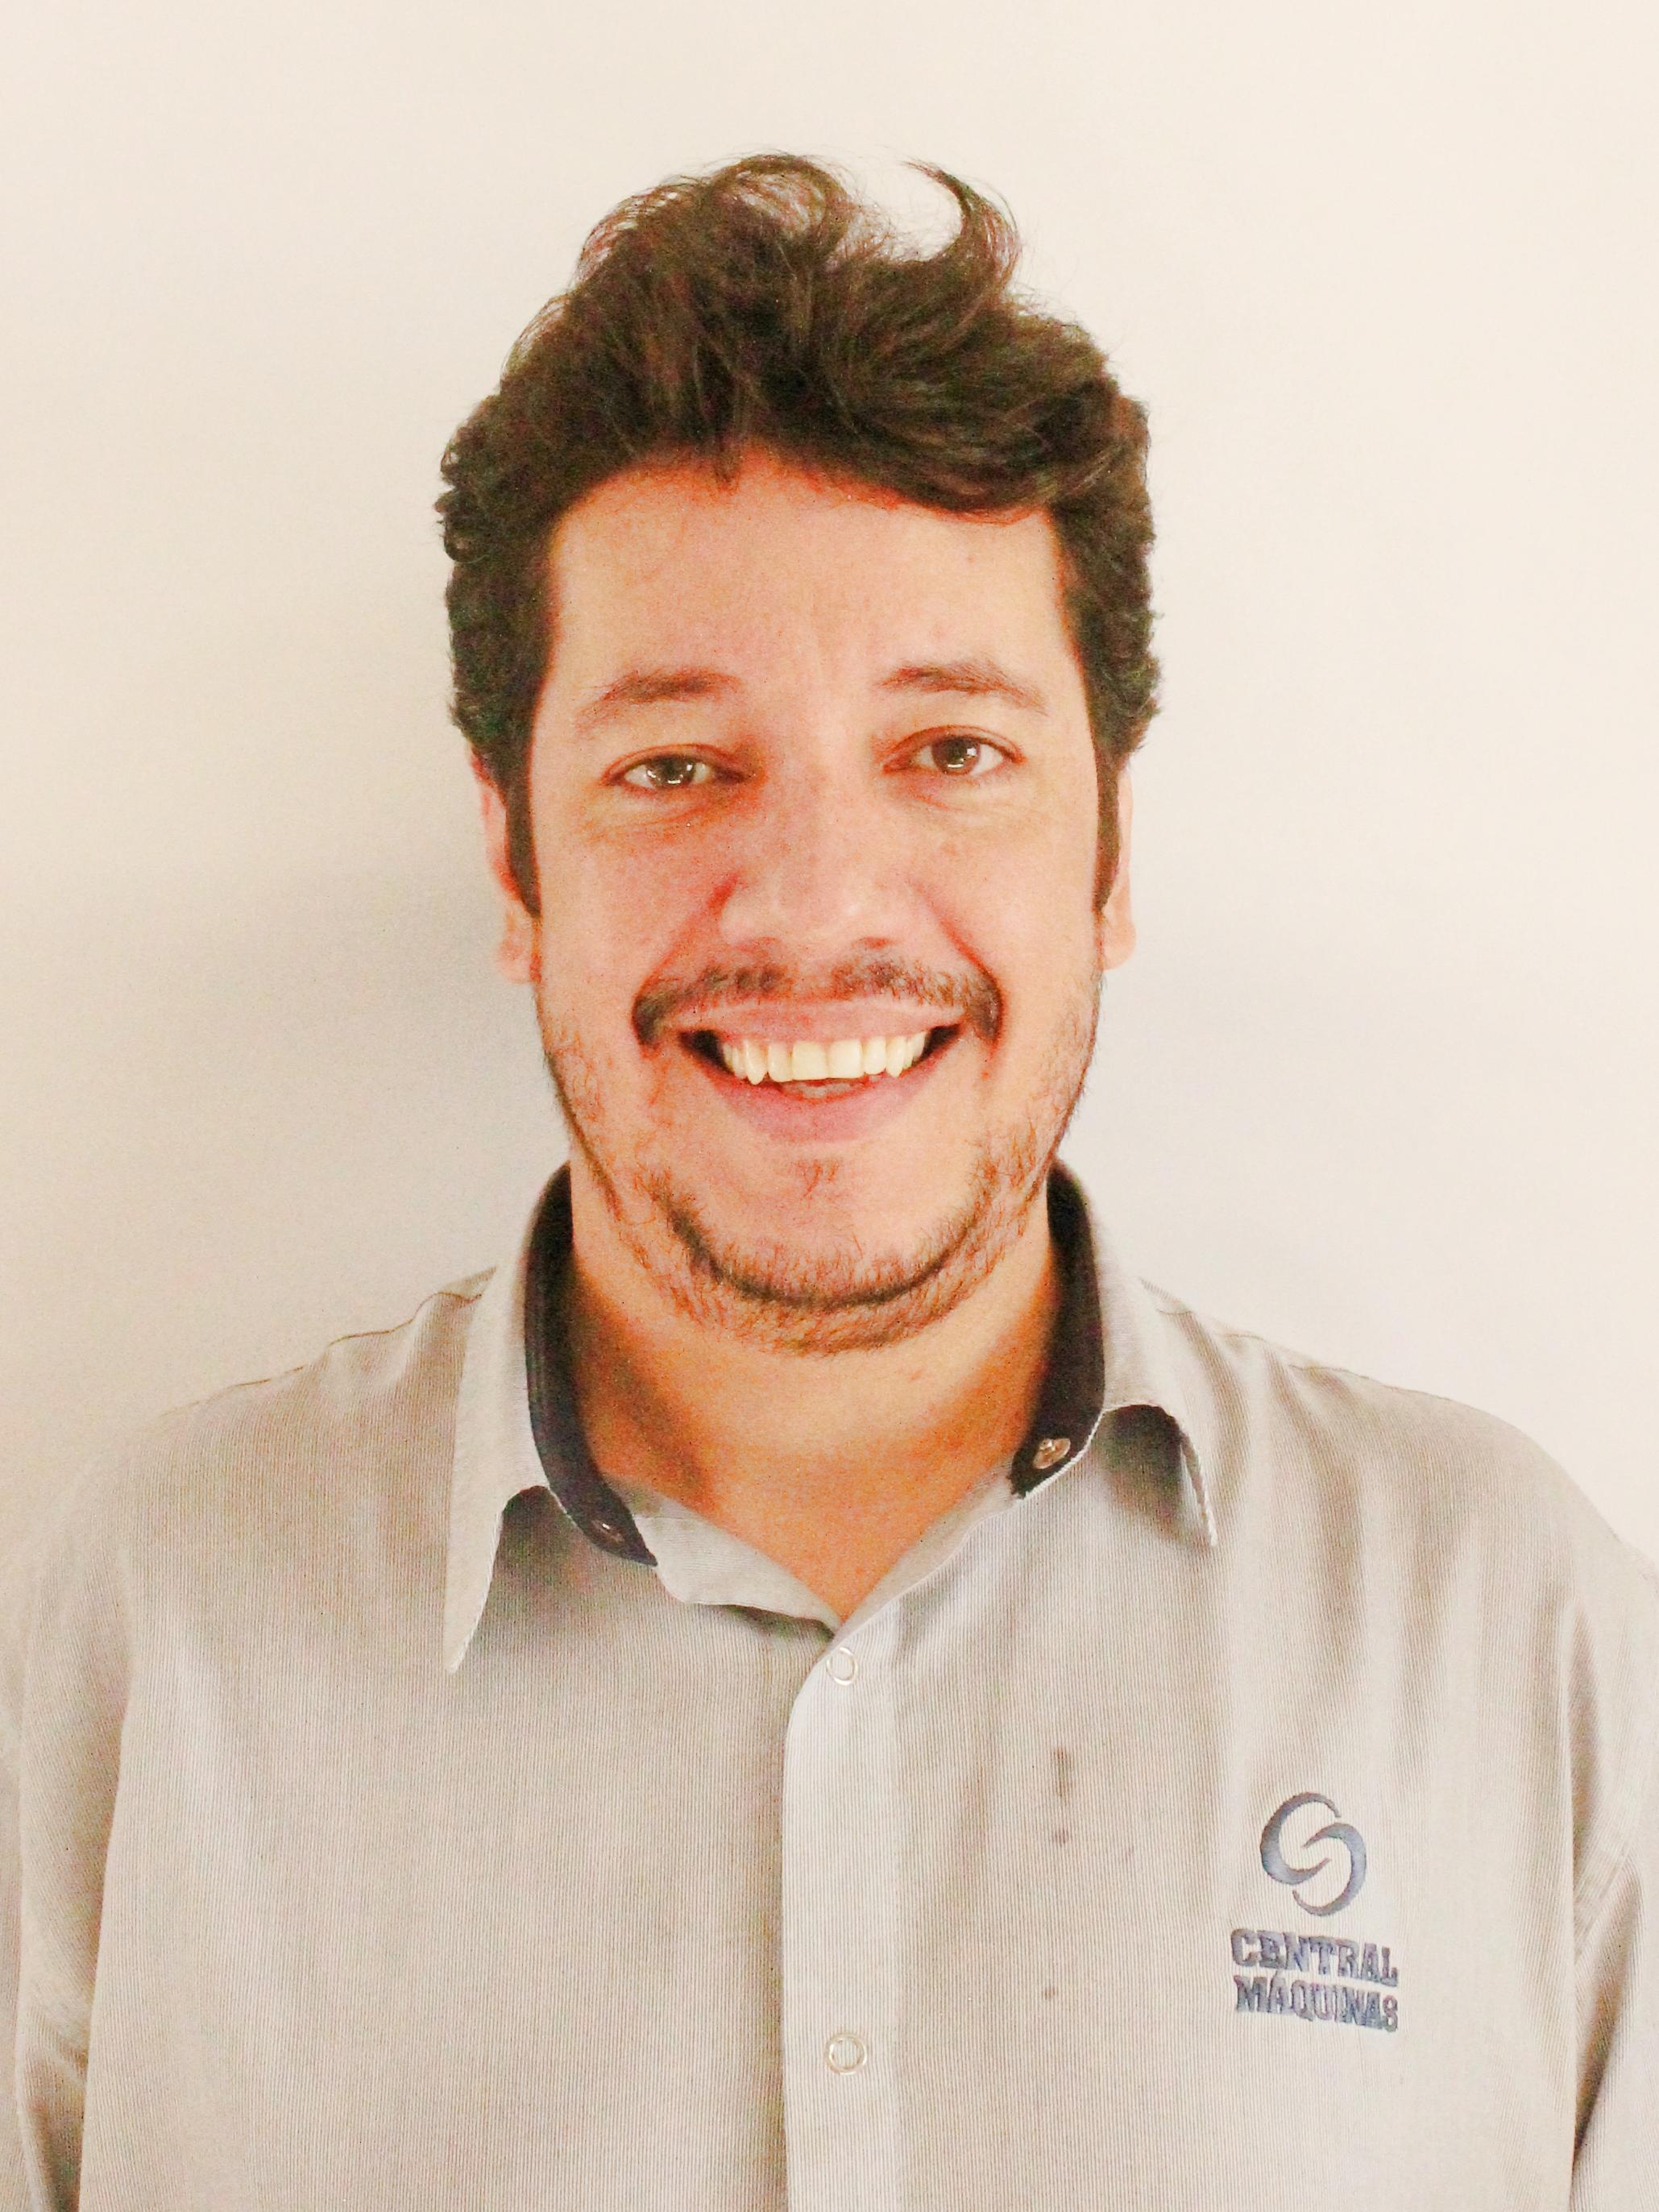 22 LUIZ GUSTAVO DIAS DE RESENDE